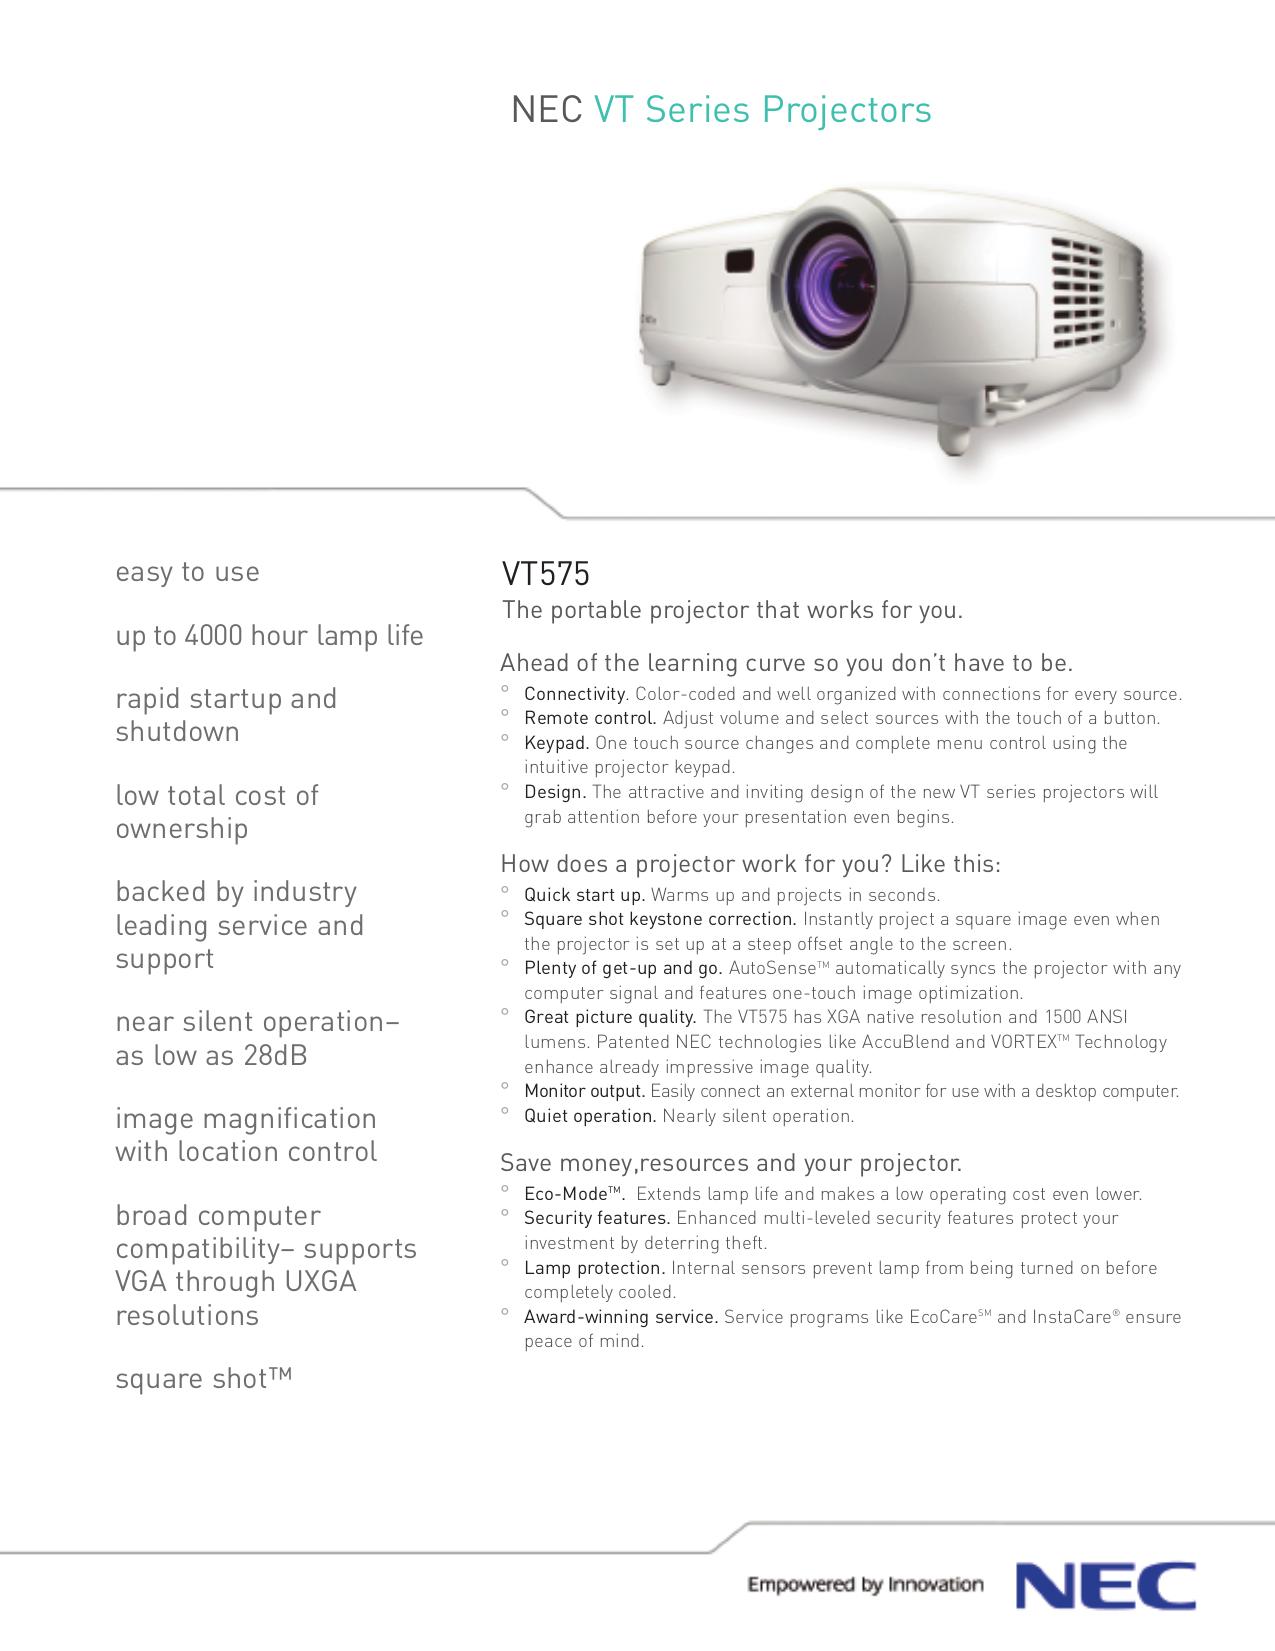 download free pdf for nec vt575 projector manual rh umlib com Volkswagen LT 35 Volkswagen LT 28